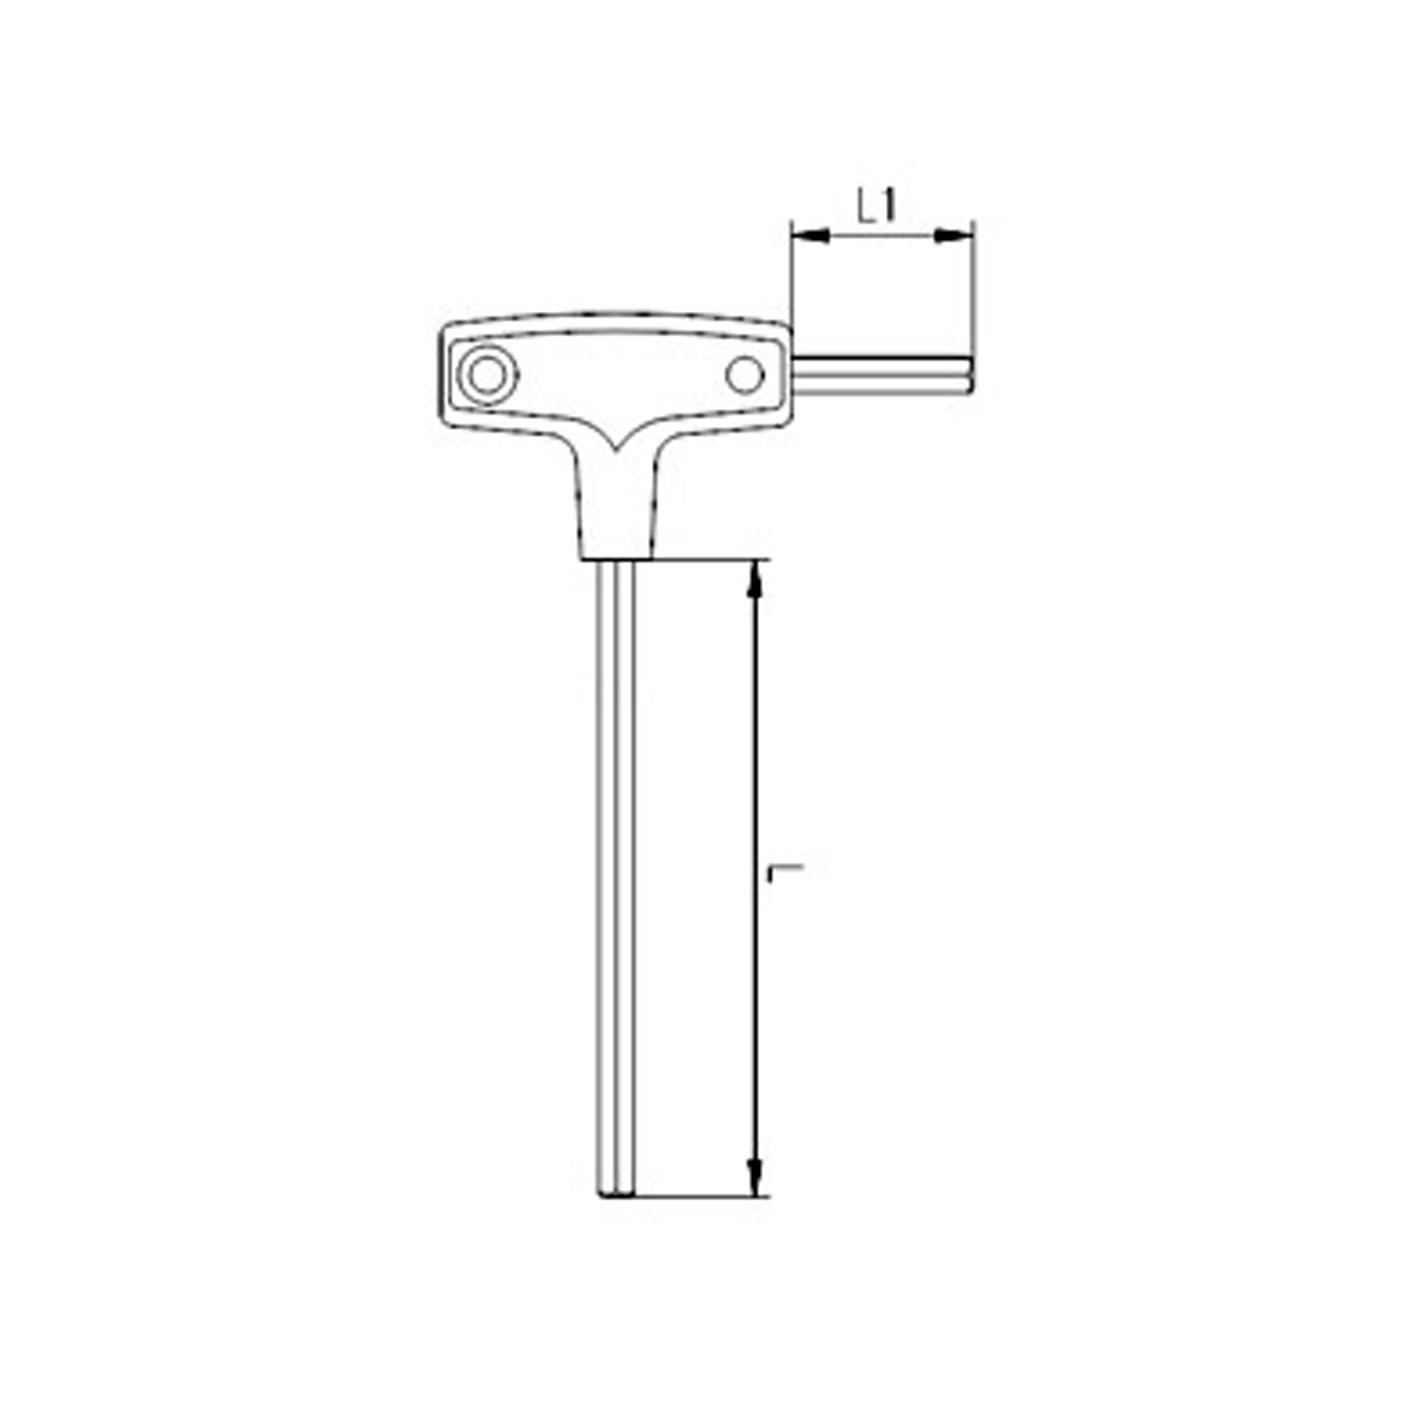 İzeltaş 3mm T Tipi Allen Anahtar